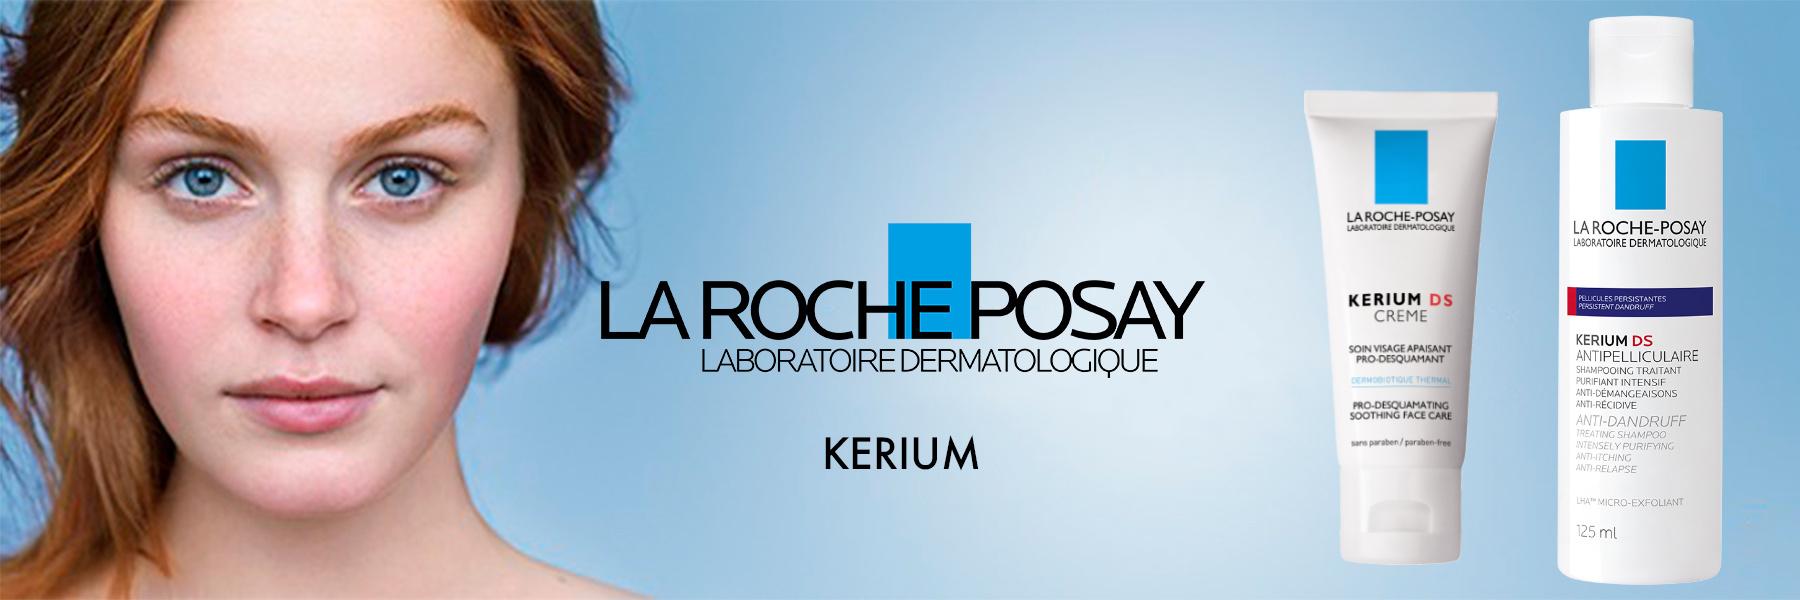 La Roche Posay Kerium